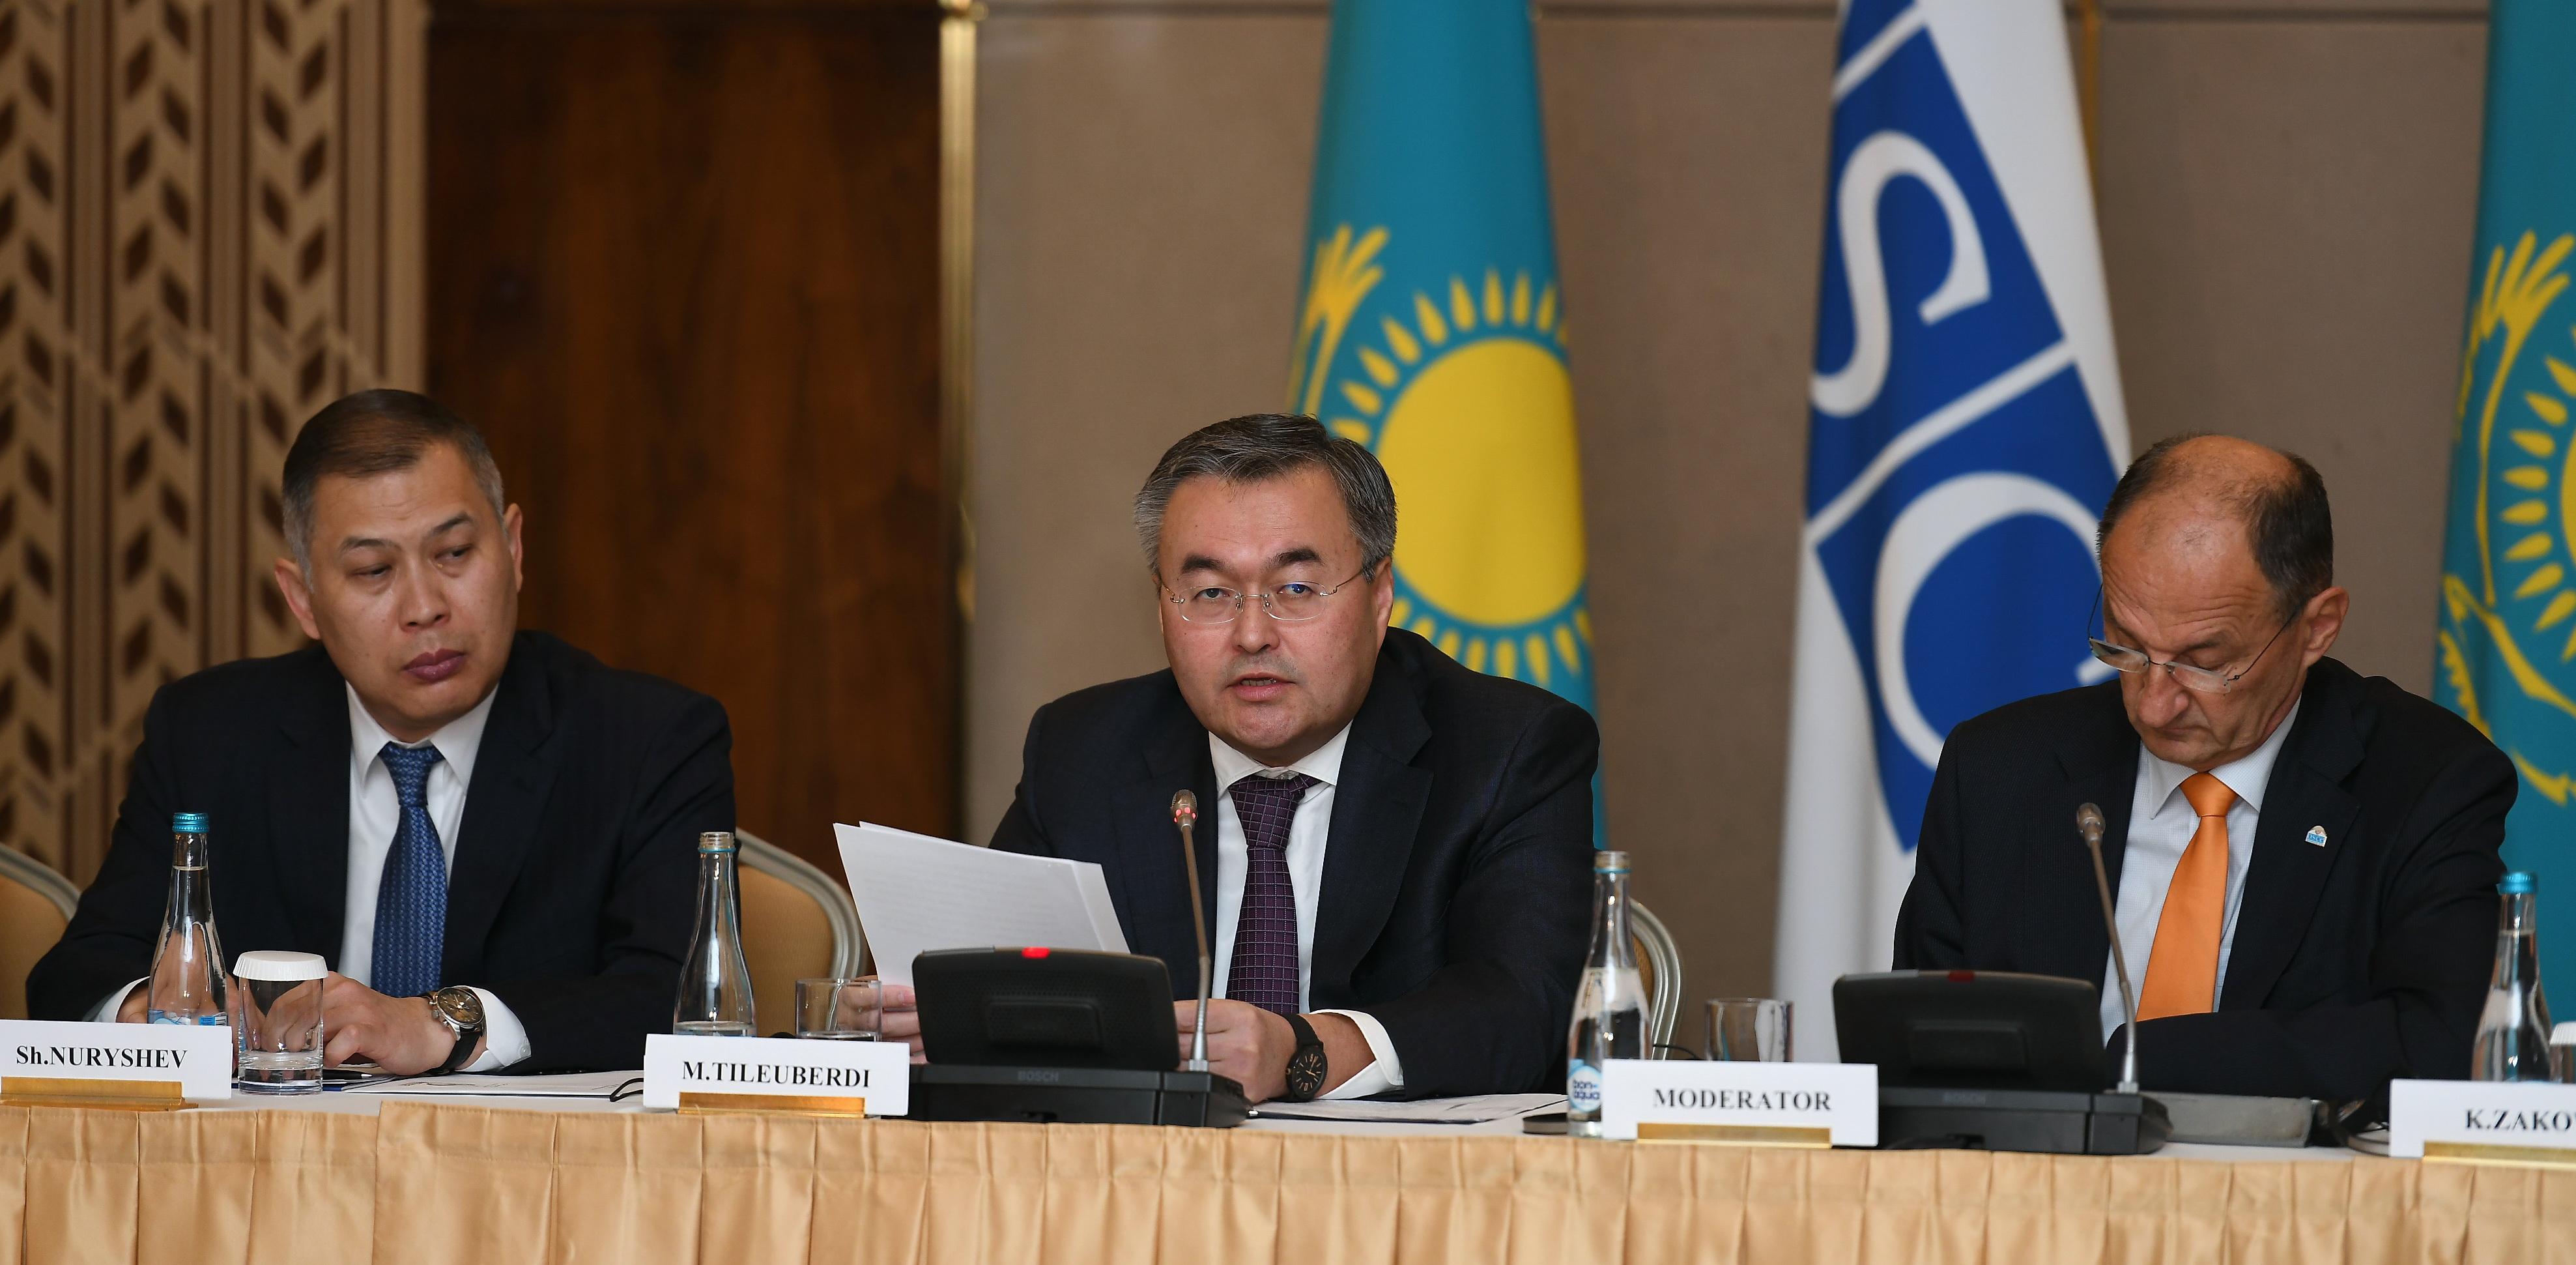 Kazakh FM urges multilateral approach on Afghanistan at OSCE